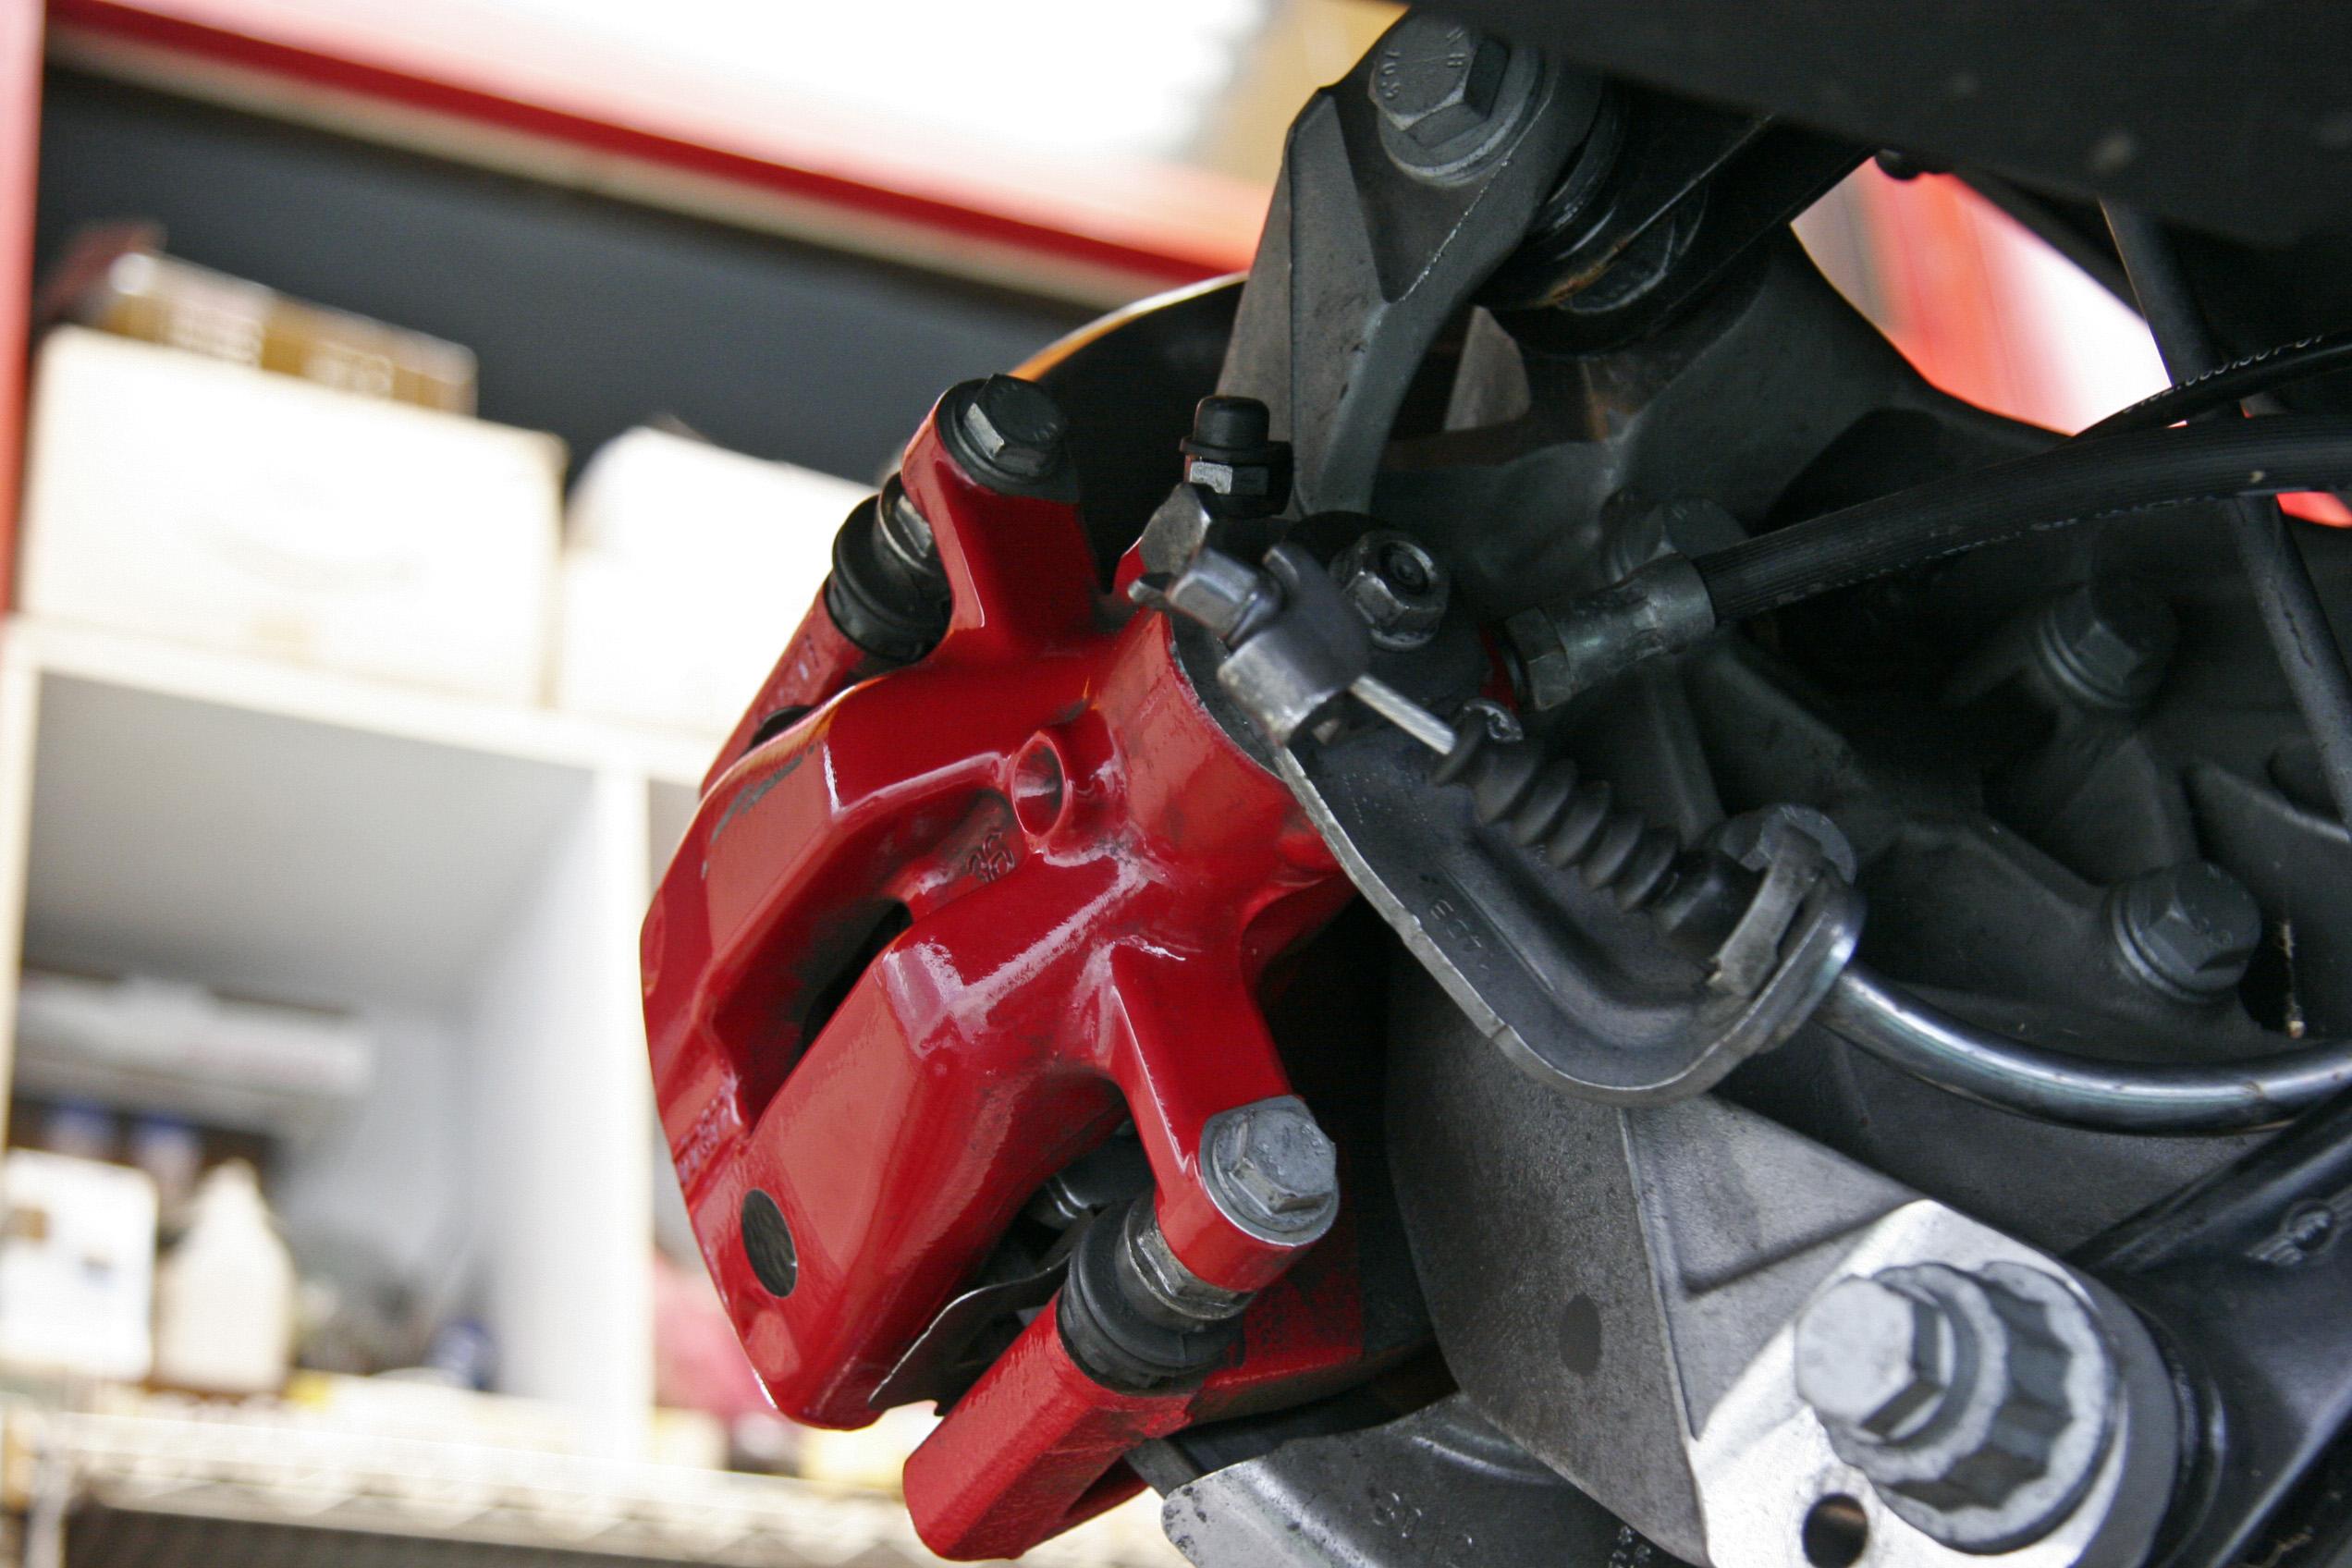 R56 MINI ブレーキ引きずり修理